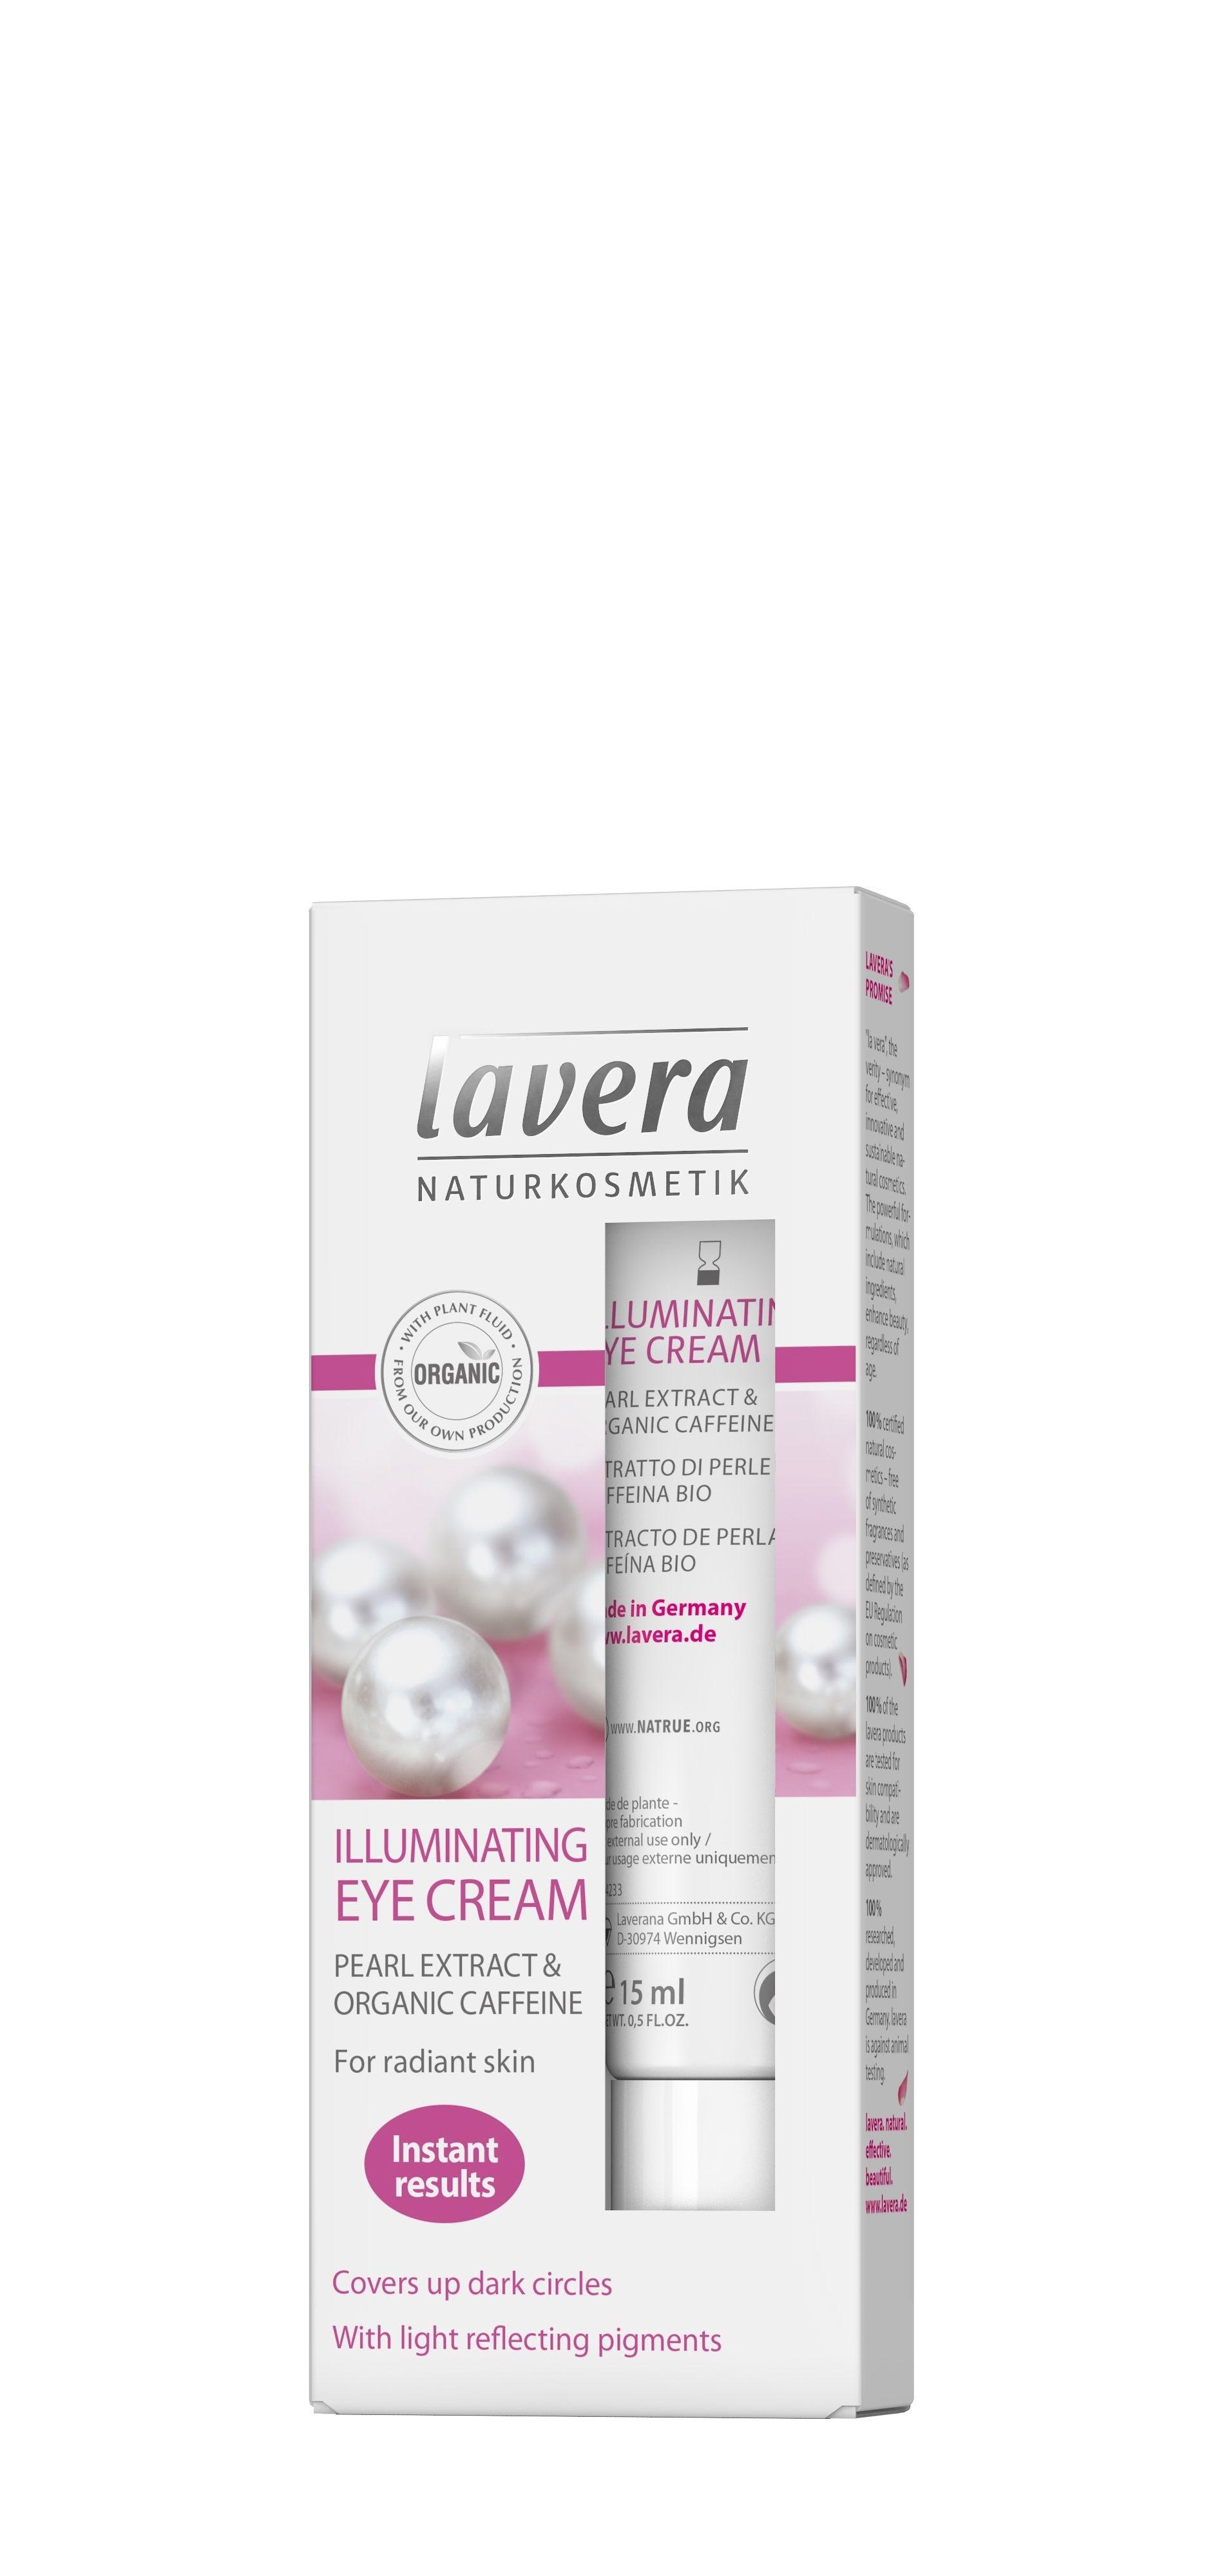 Lavera Illuminating Eye Cream 15ml - for all skin types